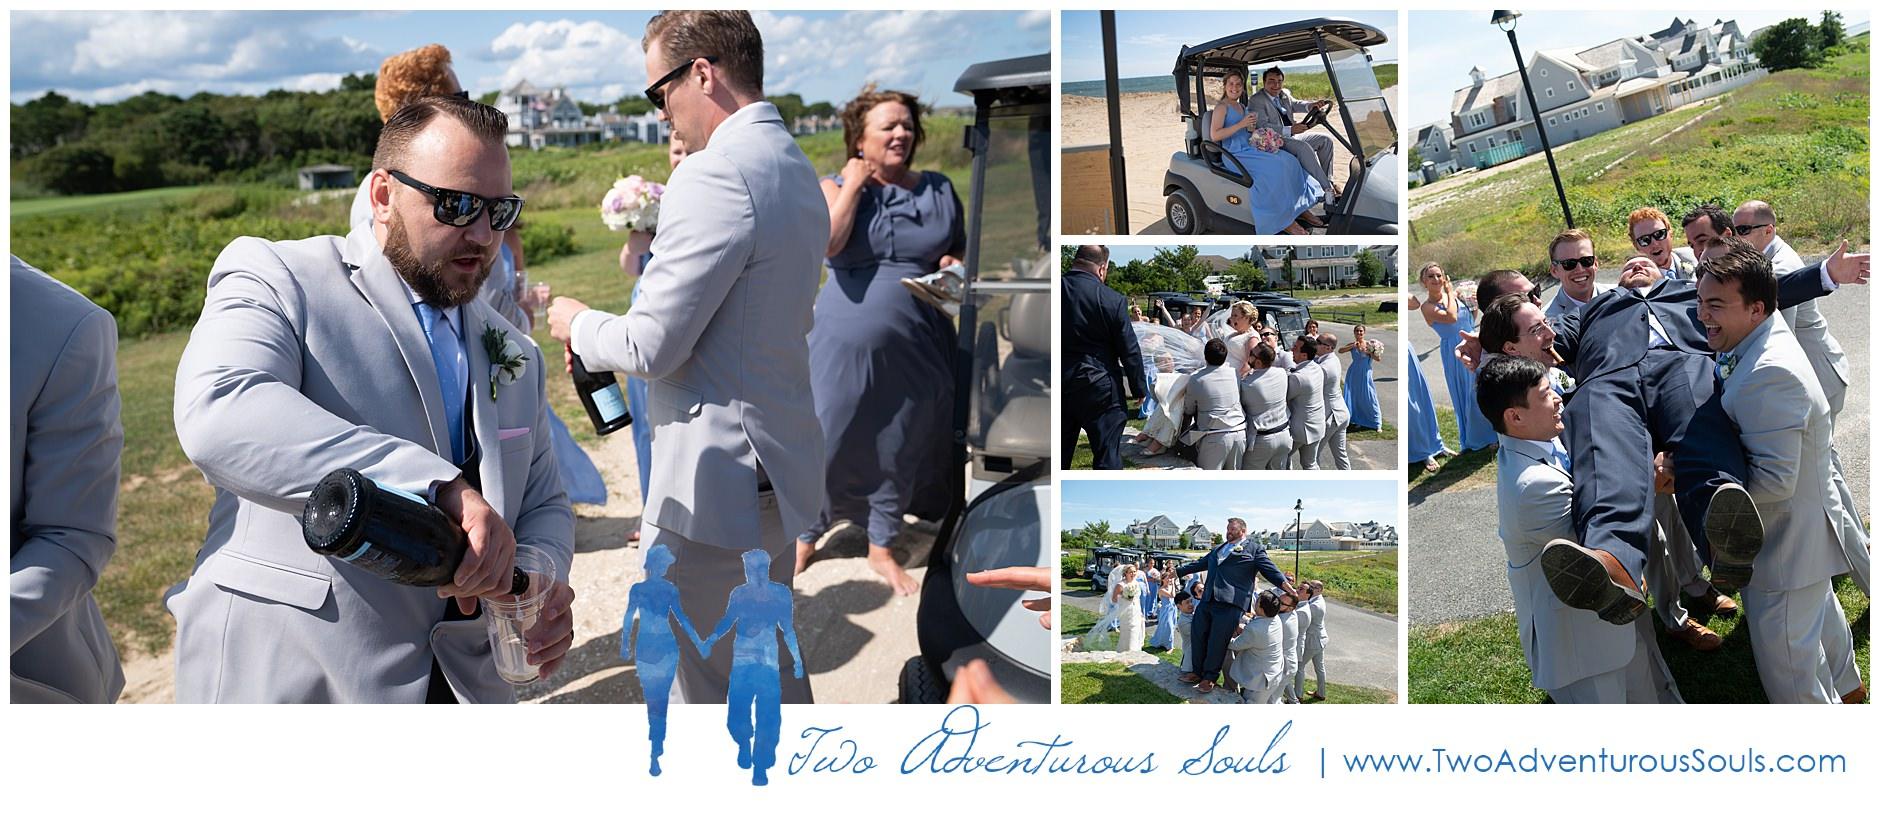 Cape Cod Wedding Photographers, Destination Wedding Photographers, Two Adventurous Souls-081019_0029.jpg